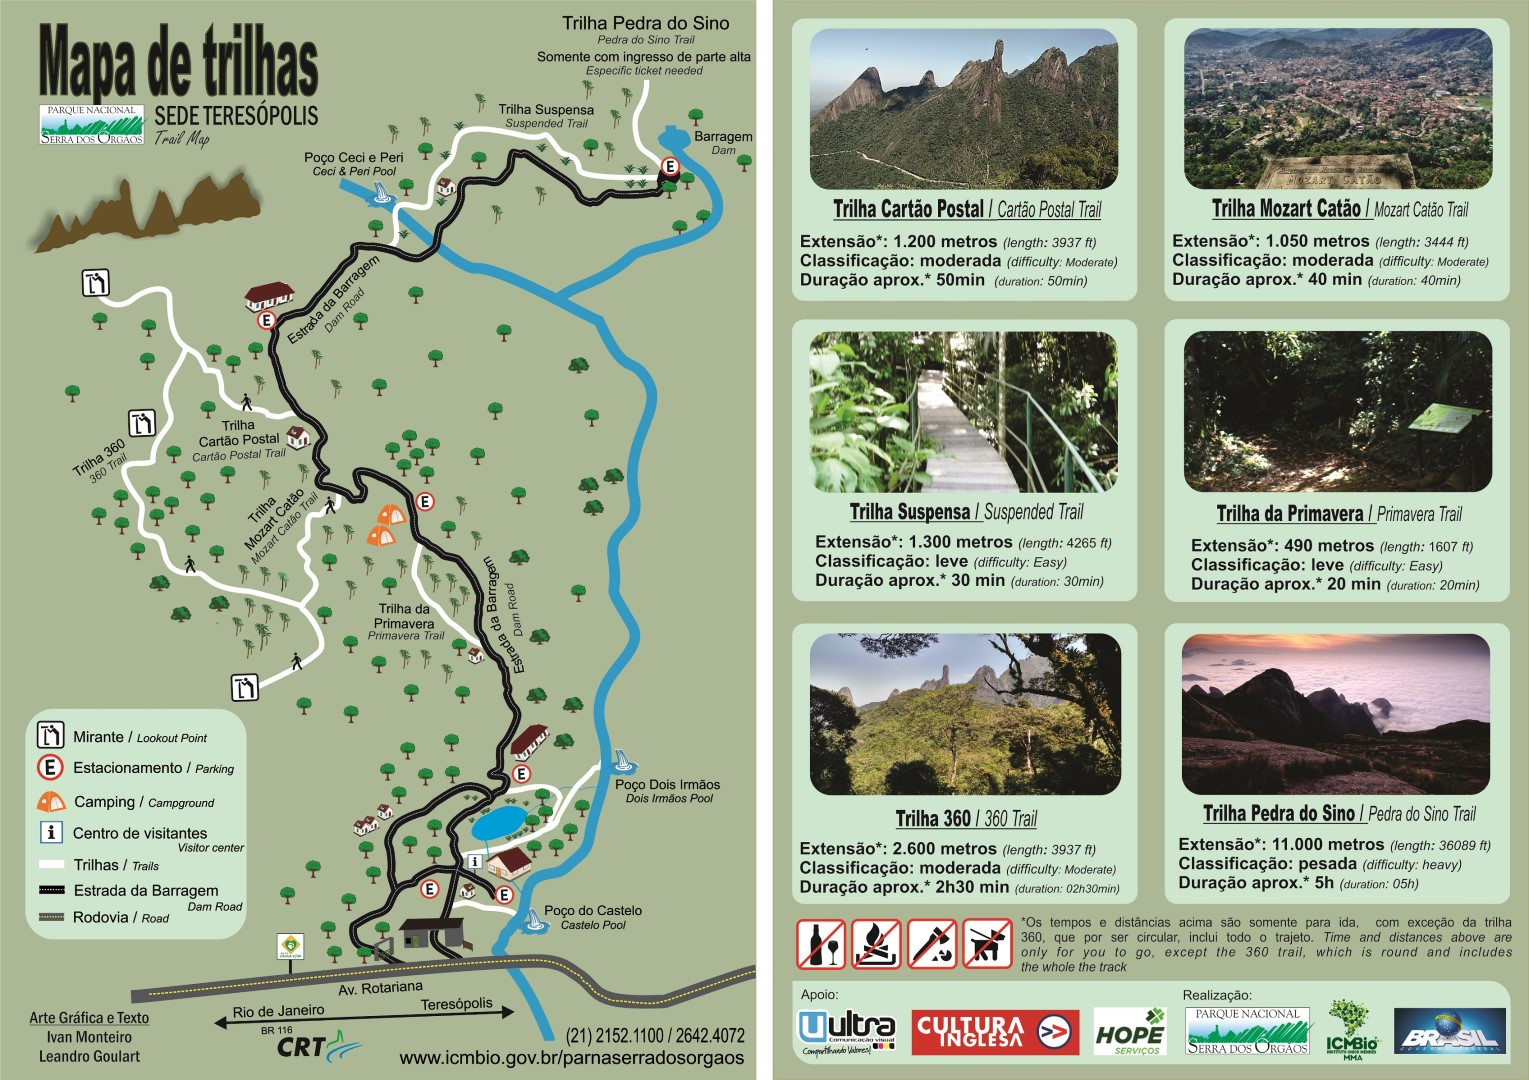 Mapa de Trilhas do PARNASO - Teresópolis RJ